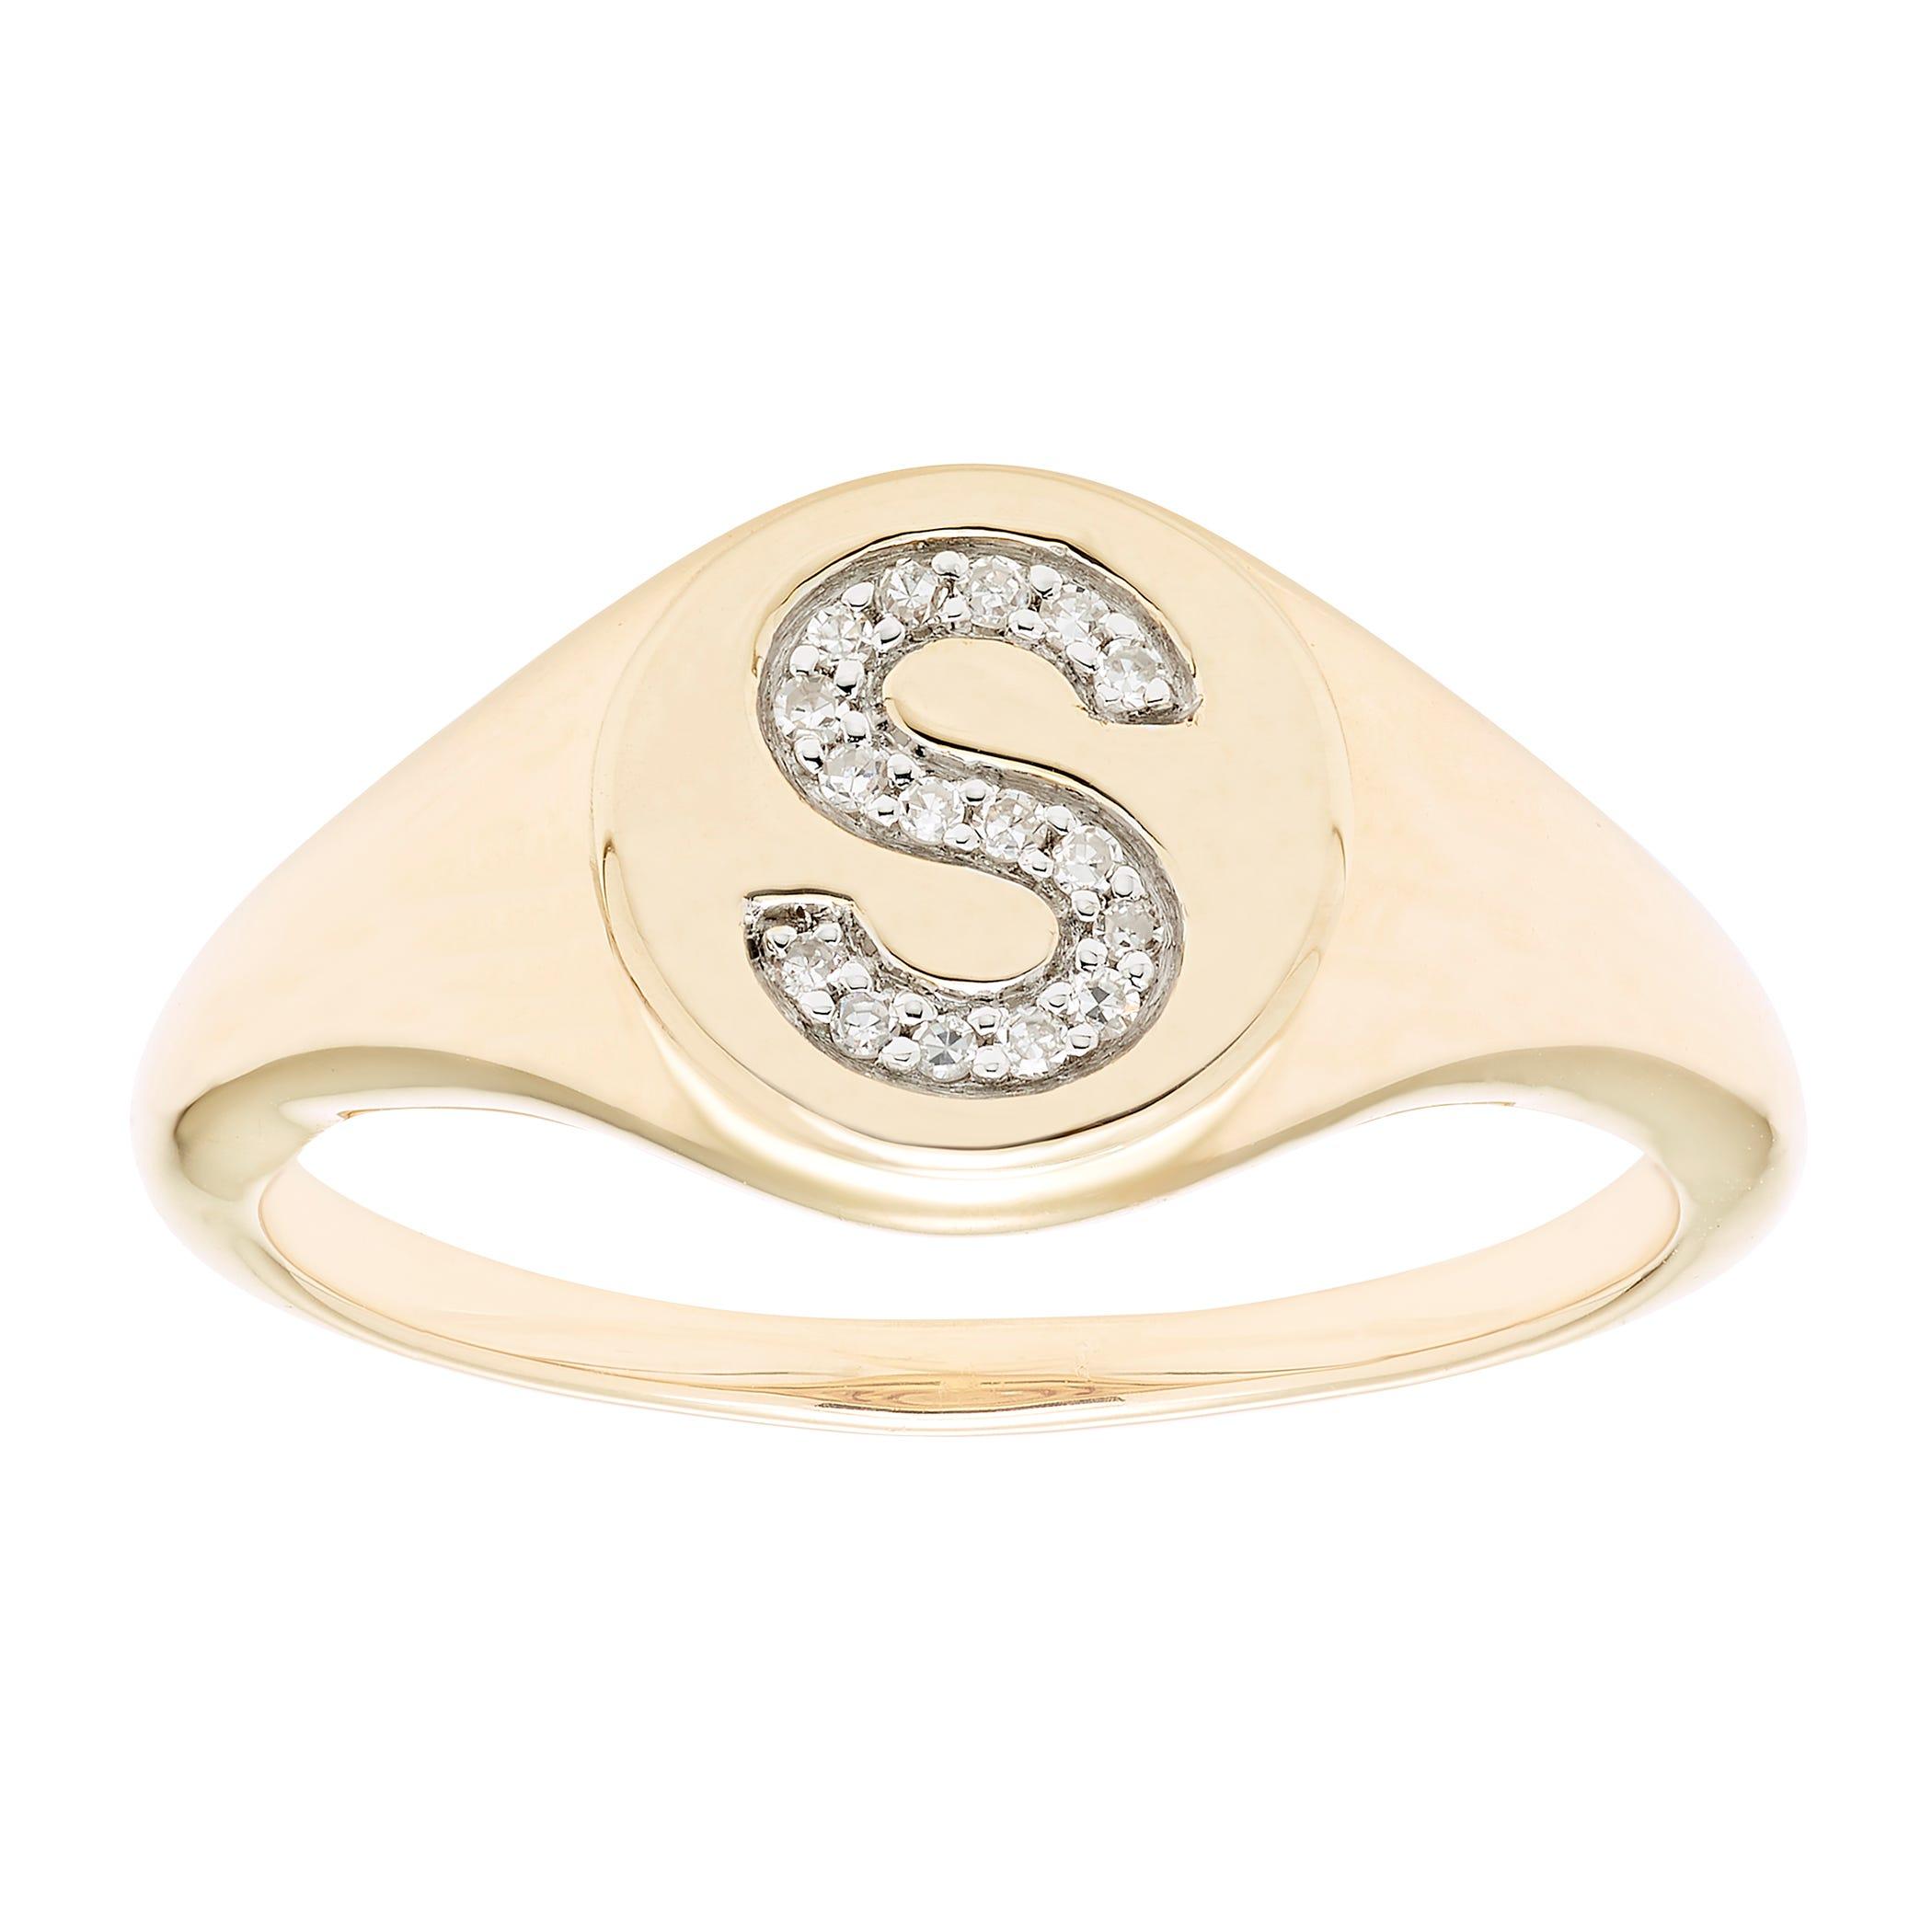 Diamond Initial S Signet Ring in 14k Yellow Gold